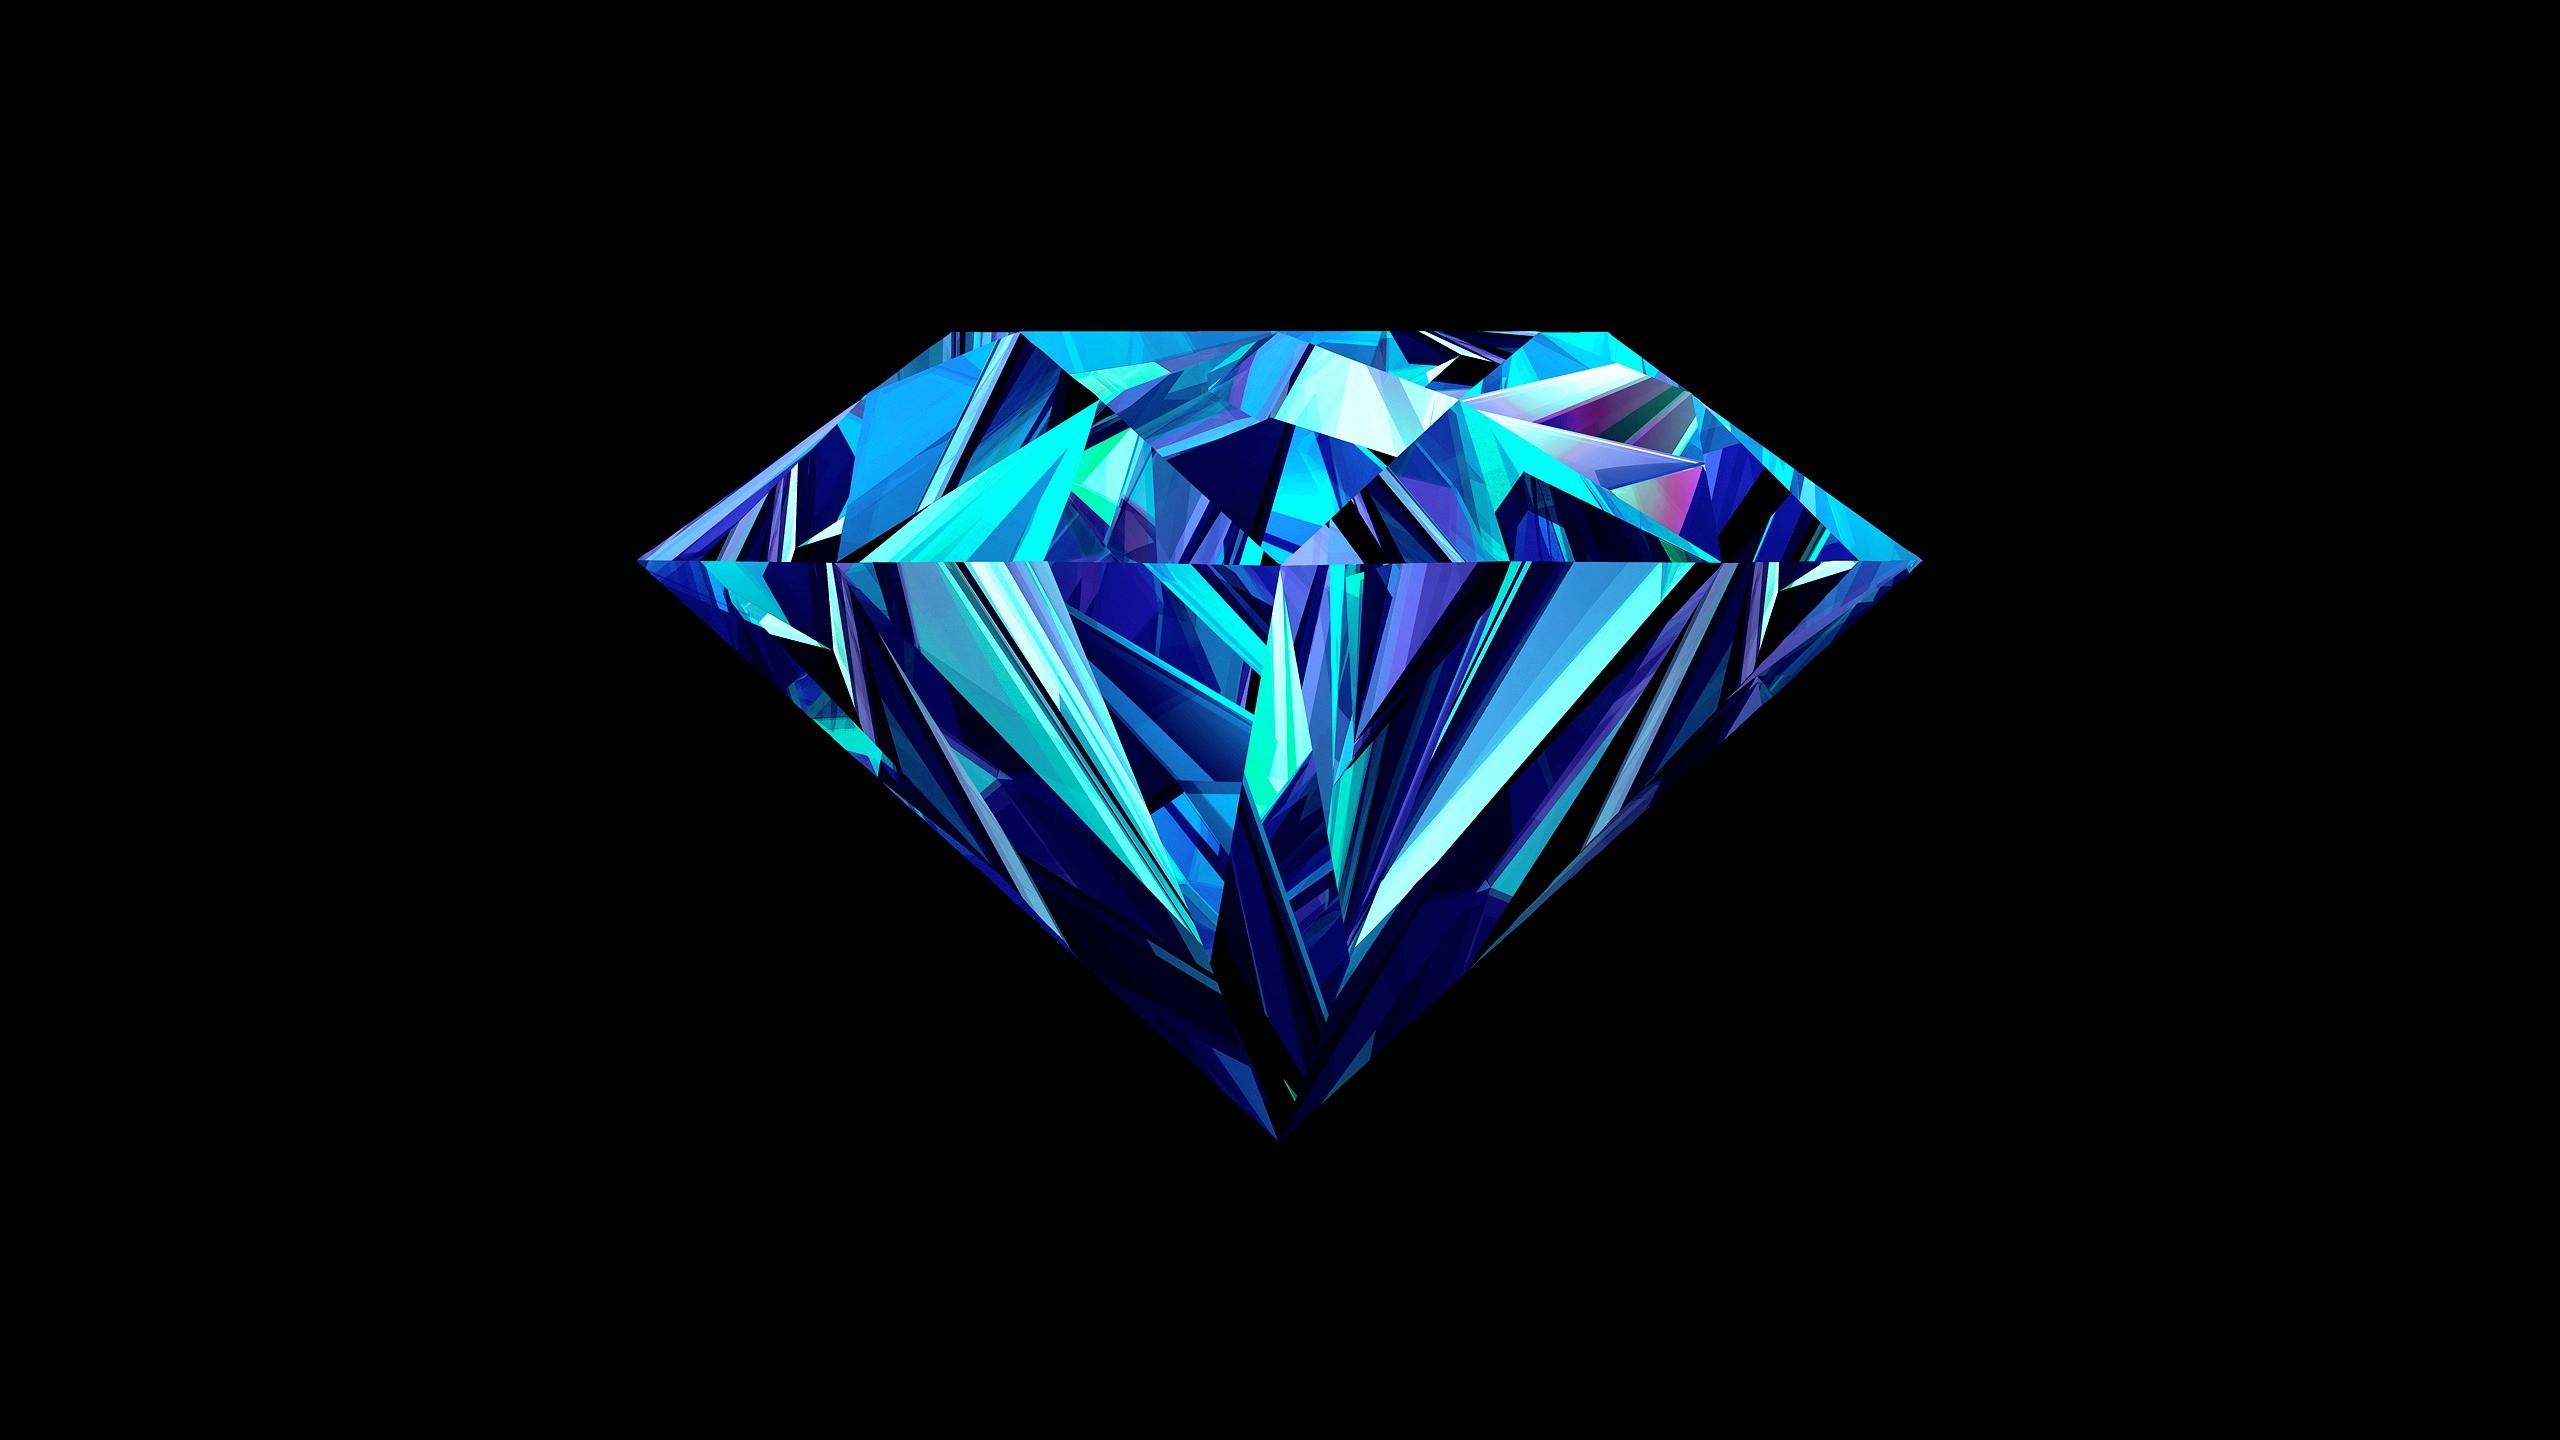 diamond wallpaper free (Nelson Robertson 1920 x